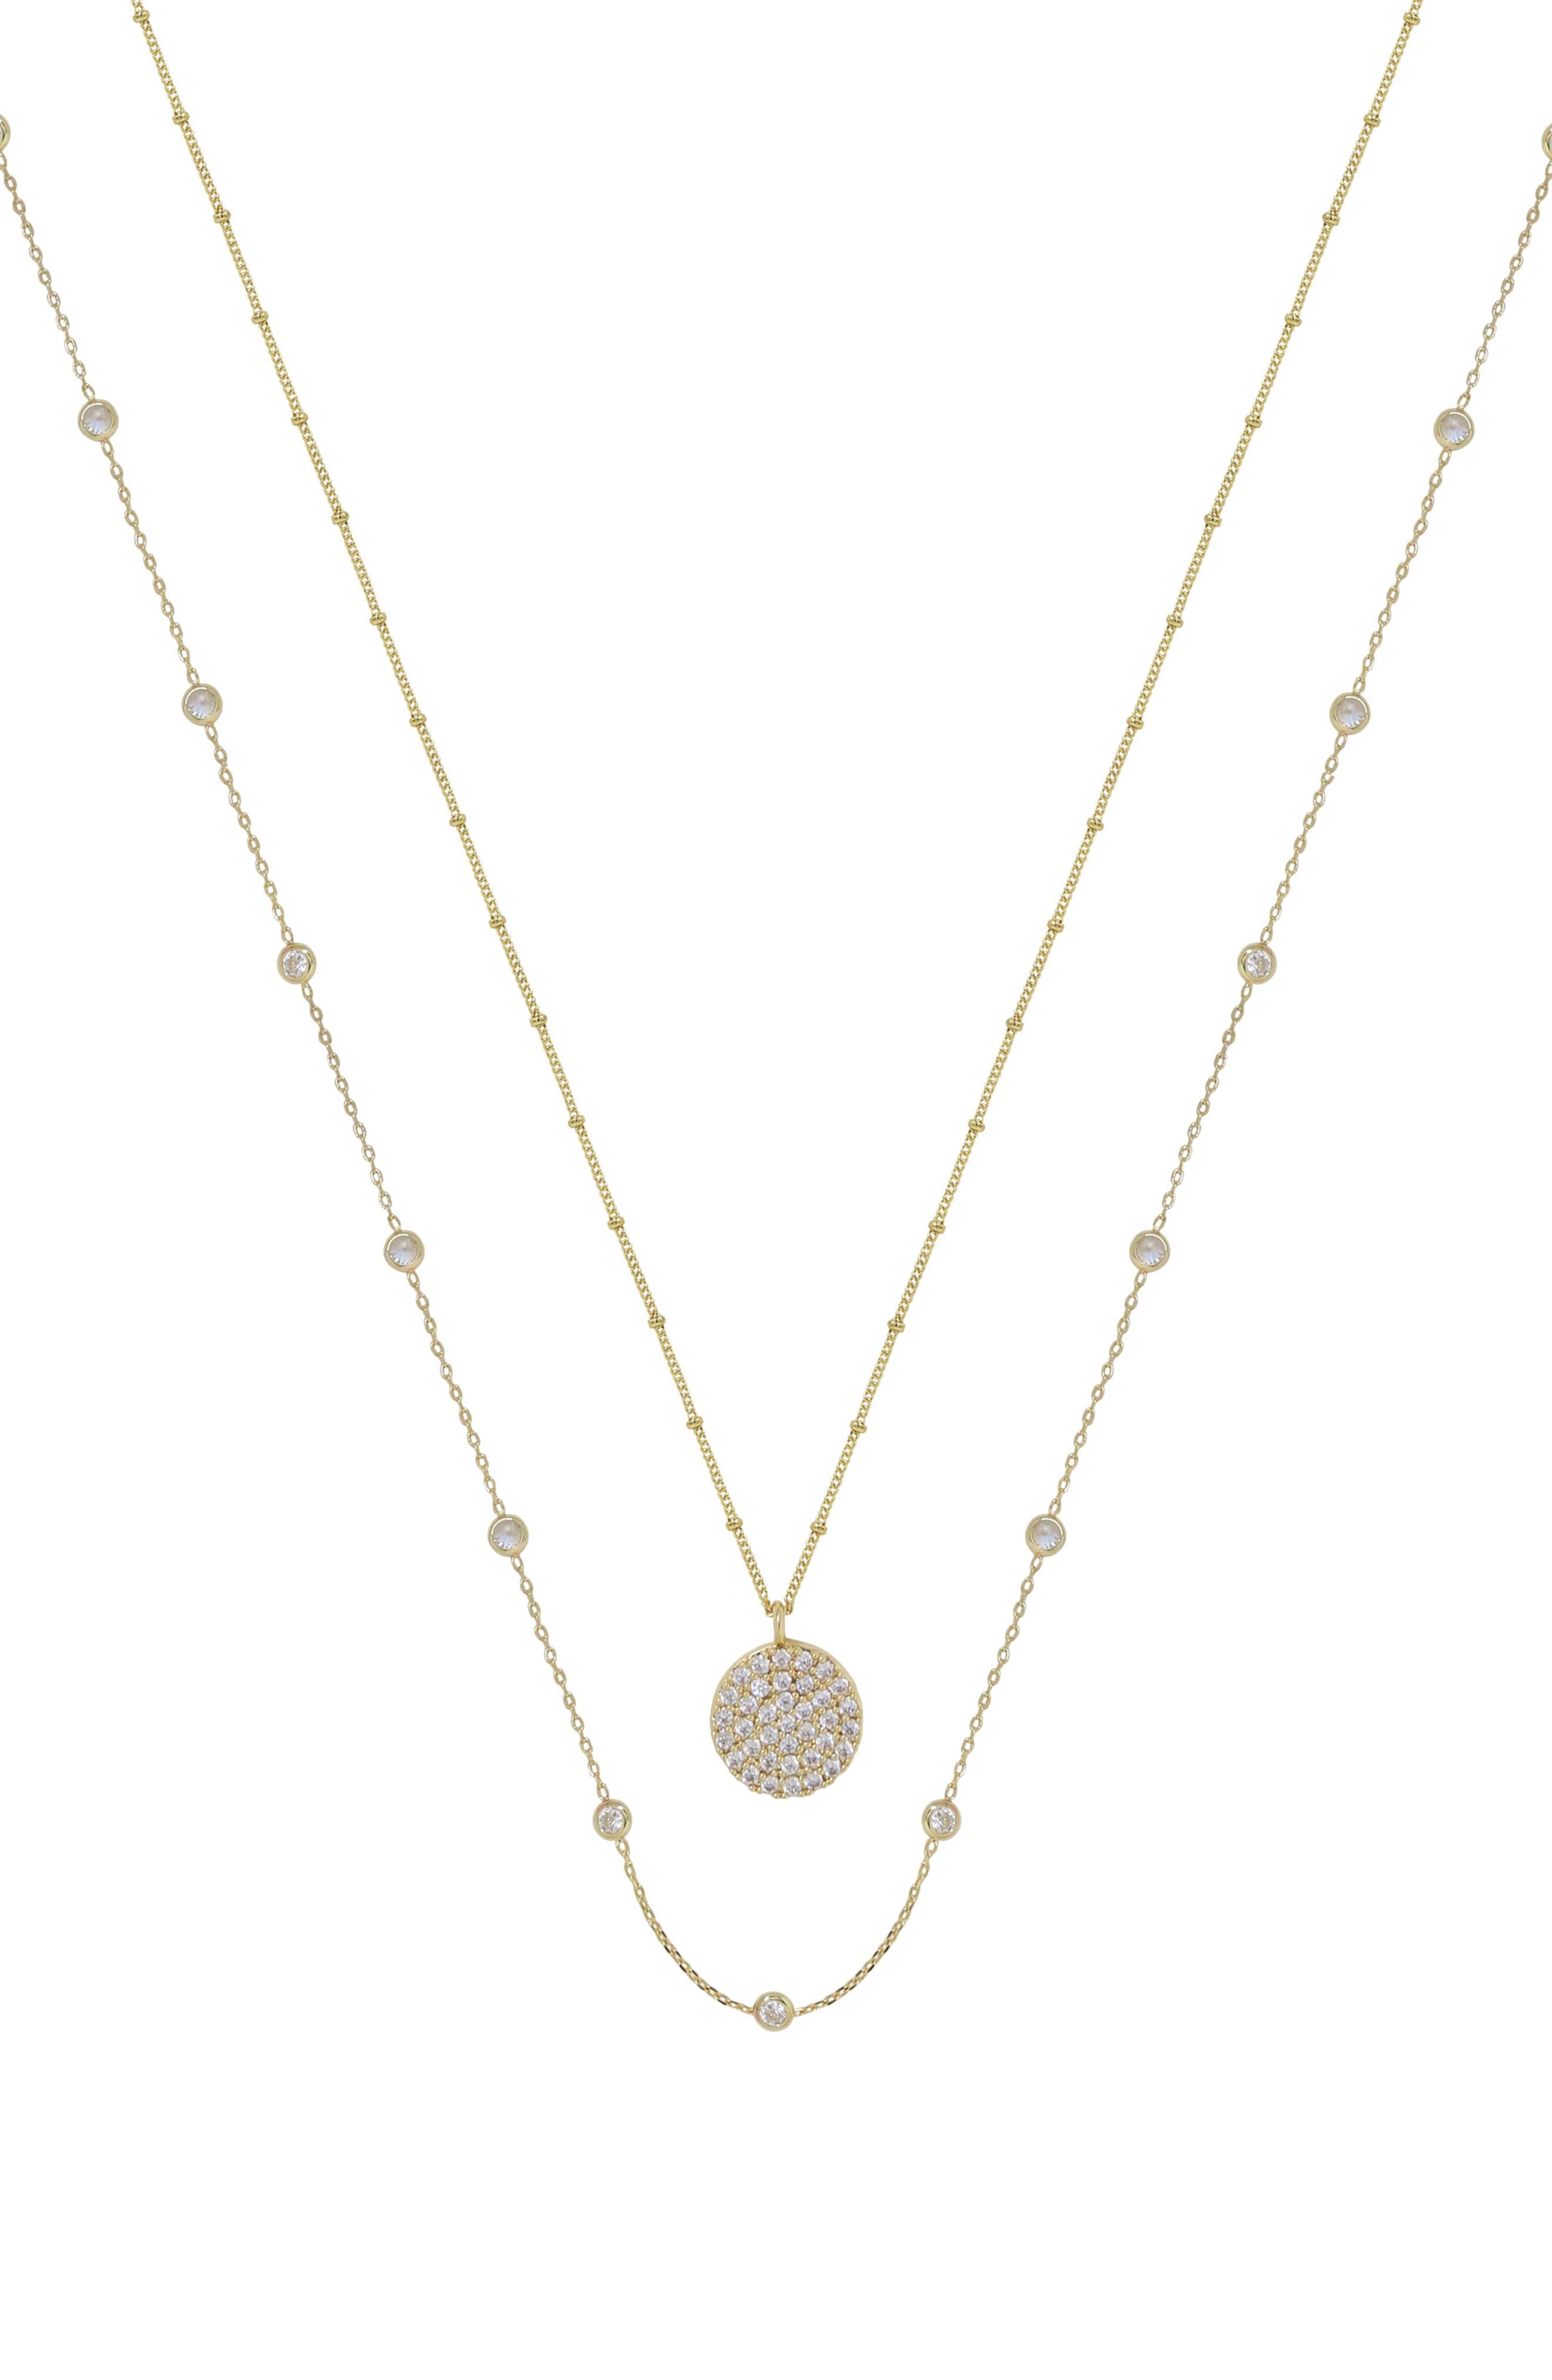 Set Of 2 Cubic Zirconia Necklaces